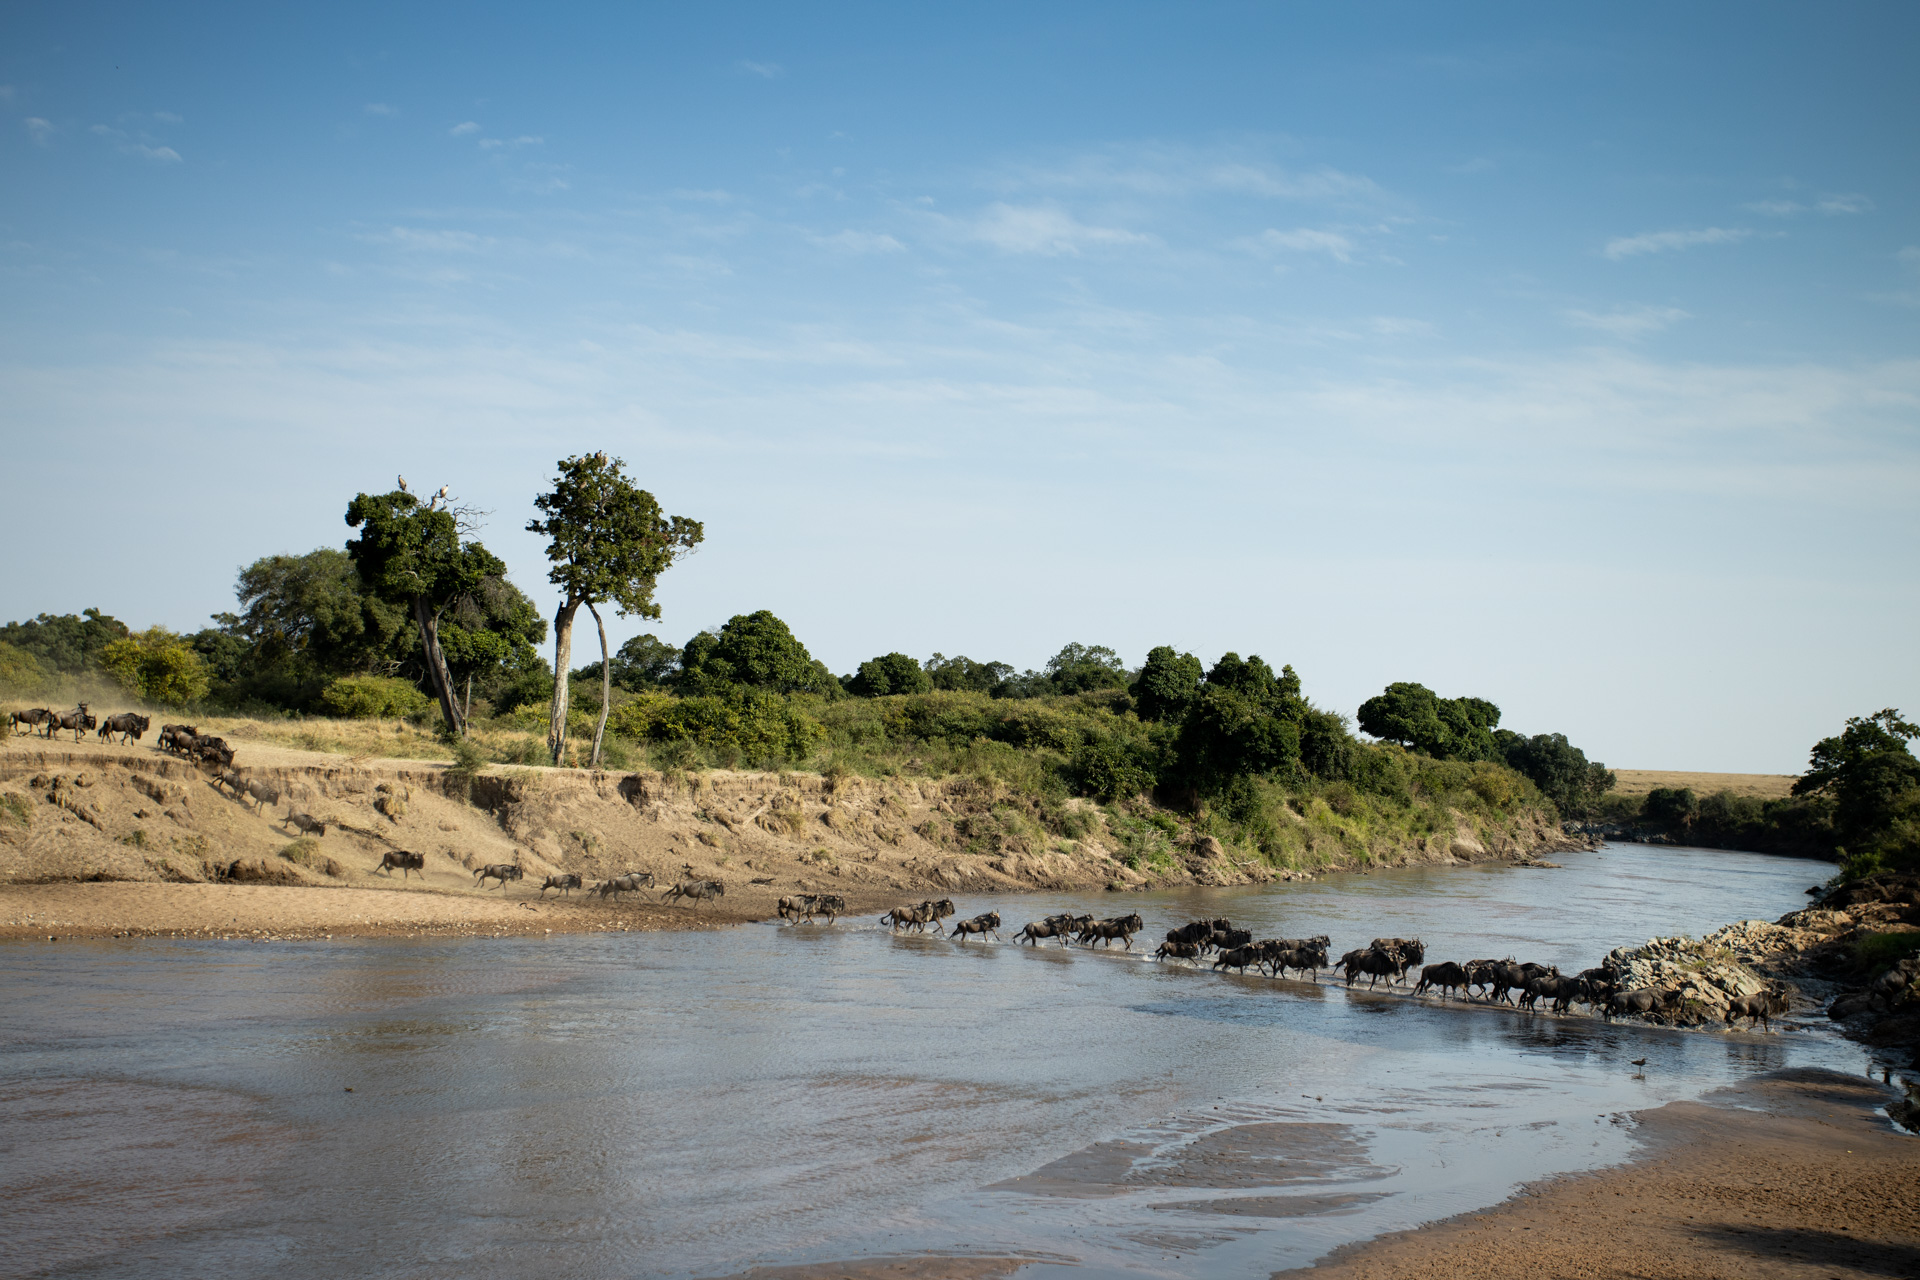 Wildebeest side on river